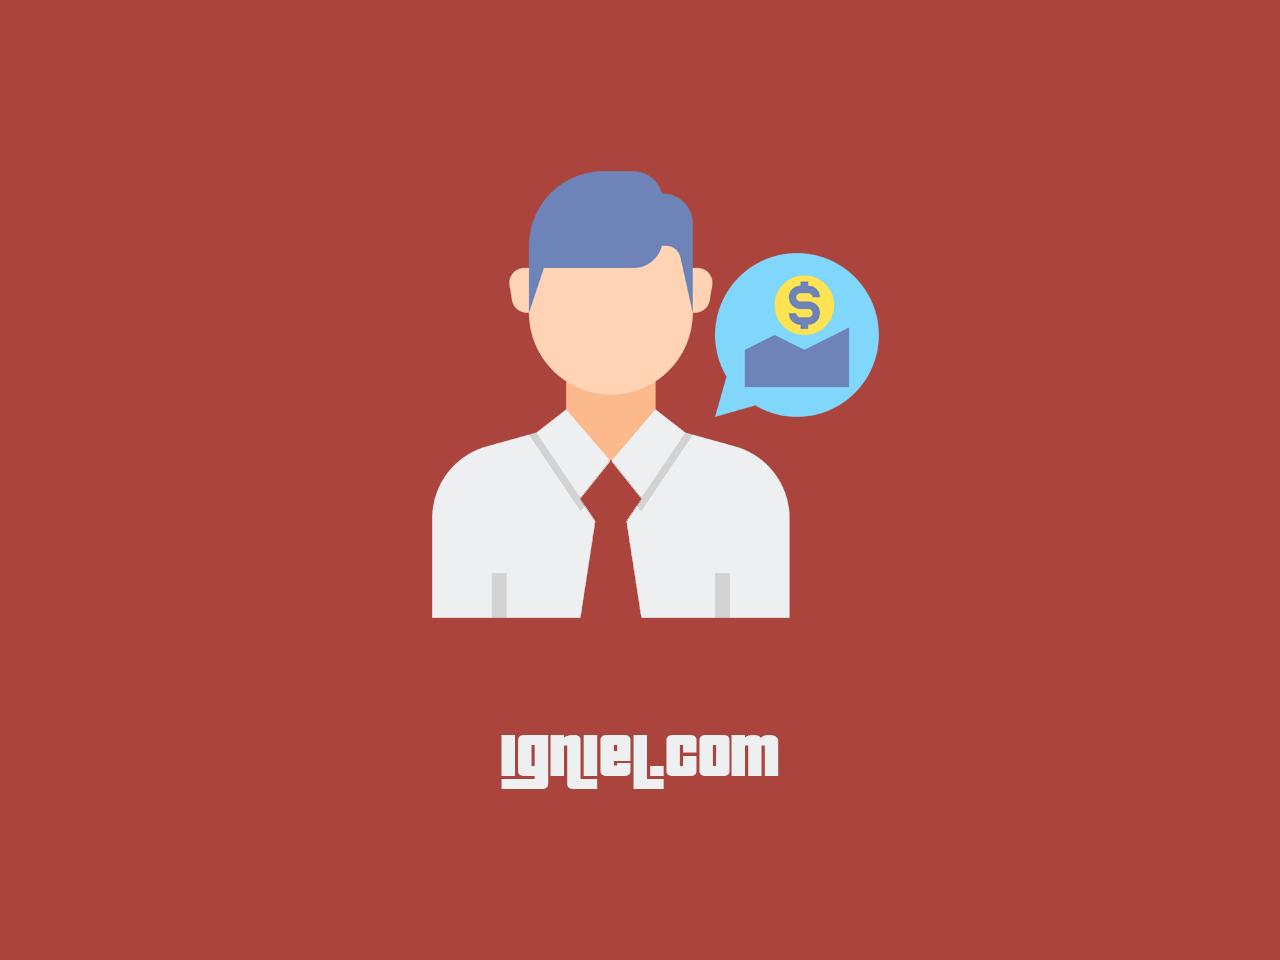 Panduan Mencari Broker Terpercaya dan Aman